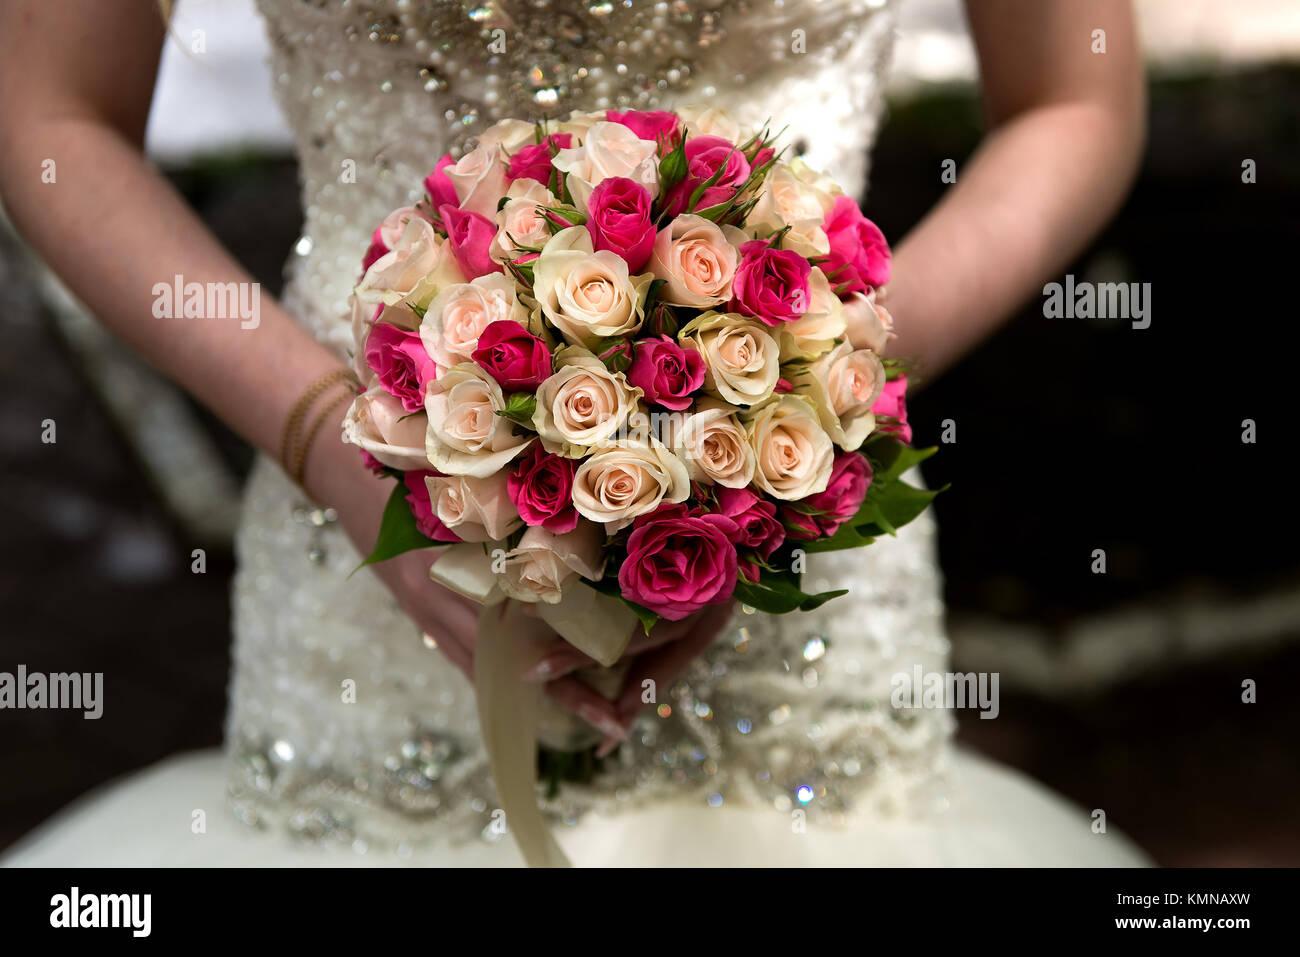 Beautiful bride holds wedding bouquet - Stock Image